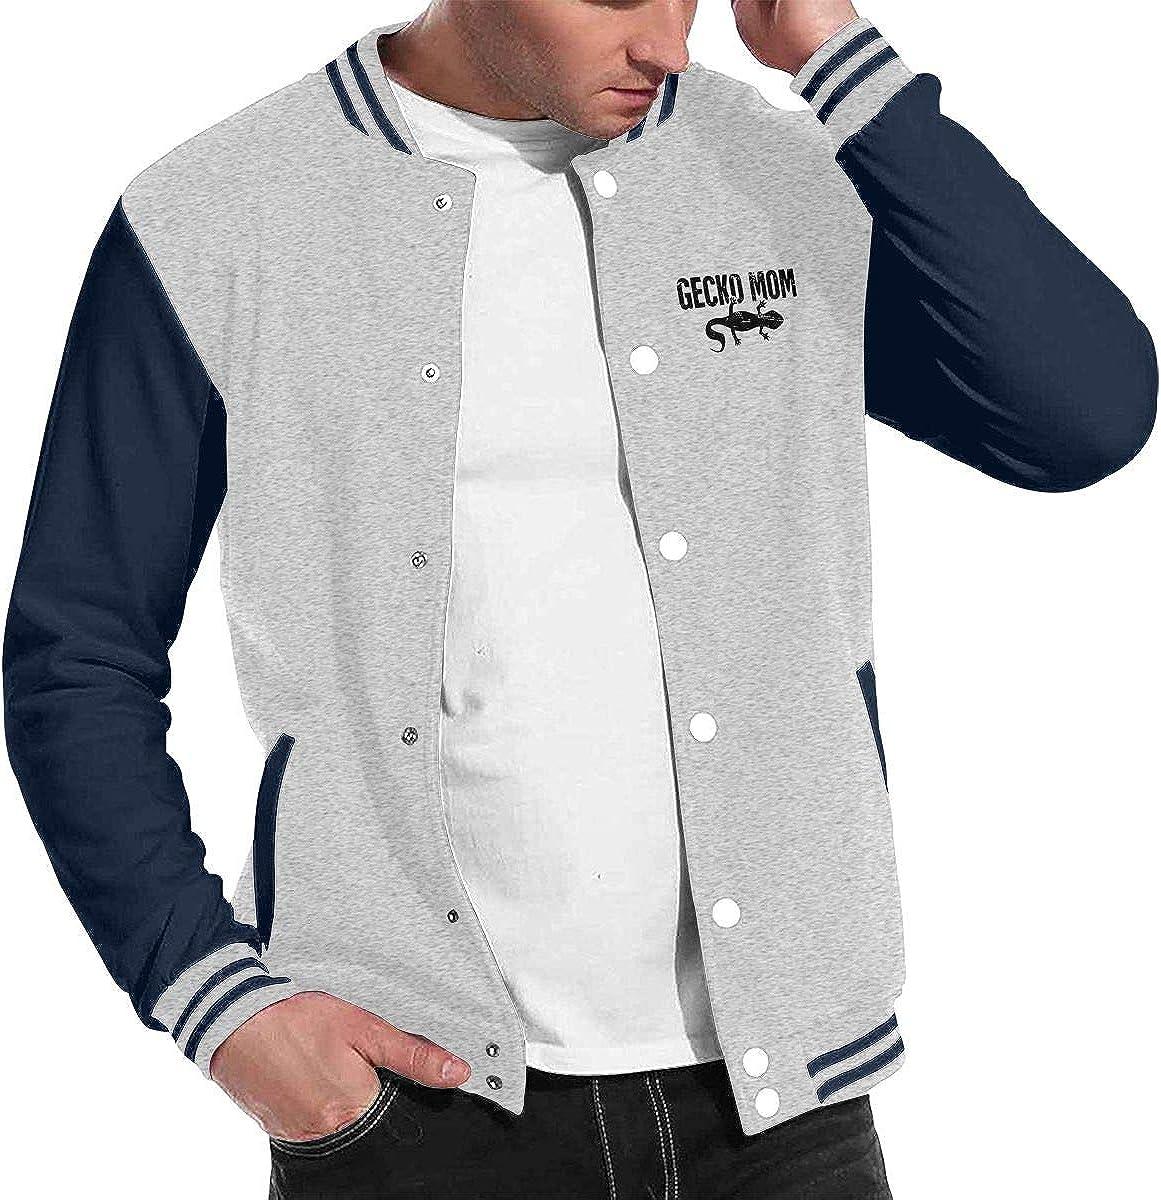 JJKKFG-H Gecko Mom Leopard Gecko Graphic Mens Cool Baseball Uniform Jacket Sport Coat